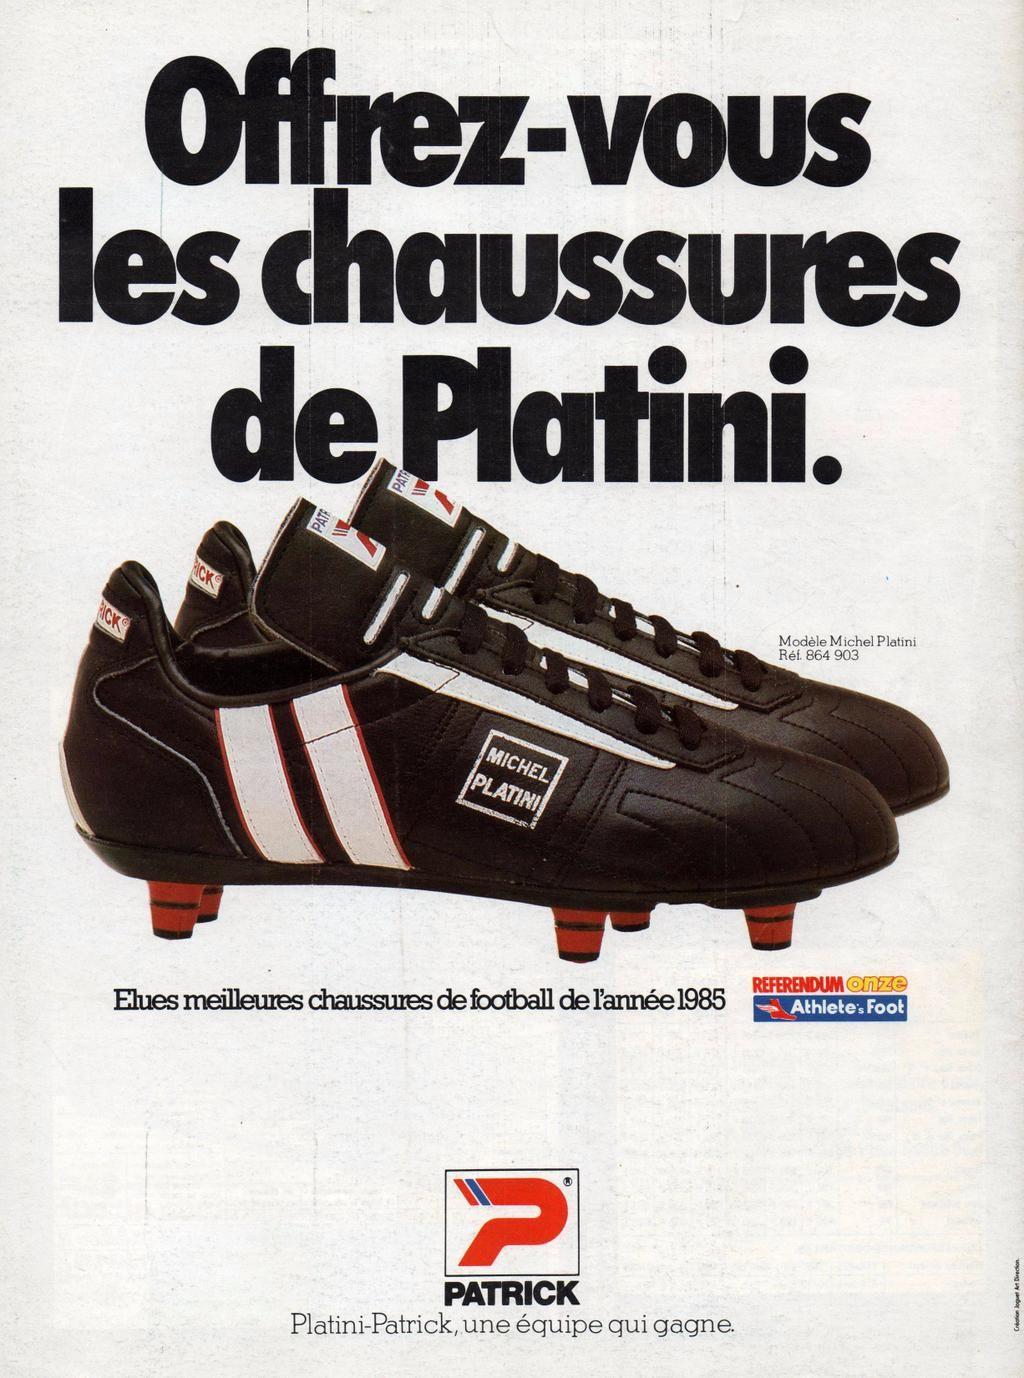 1b1c620e1 Patrick Platini. Patrick Platini Puma Football Boots ...